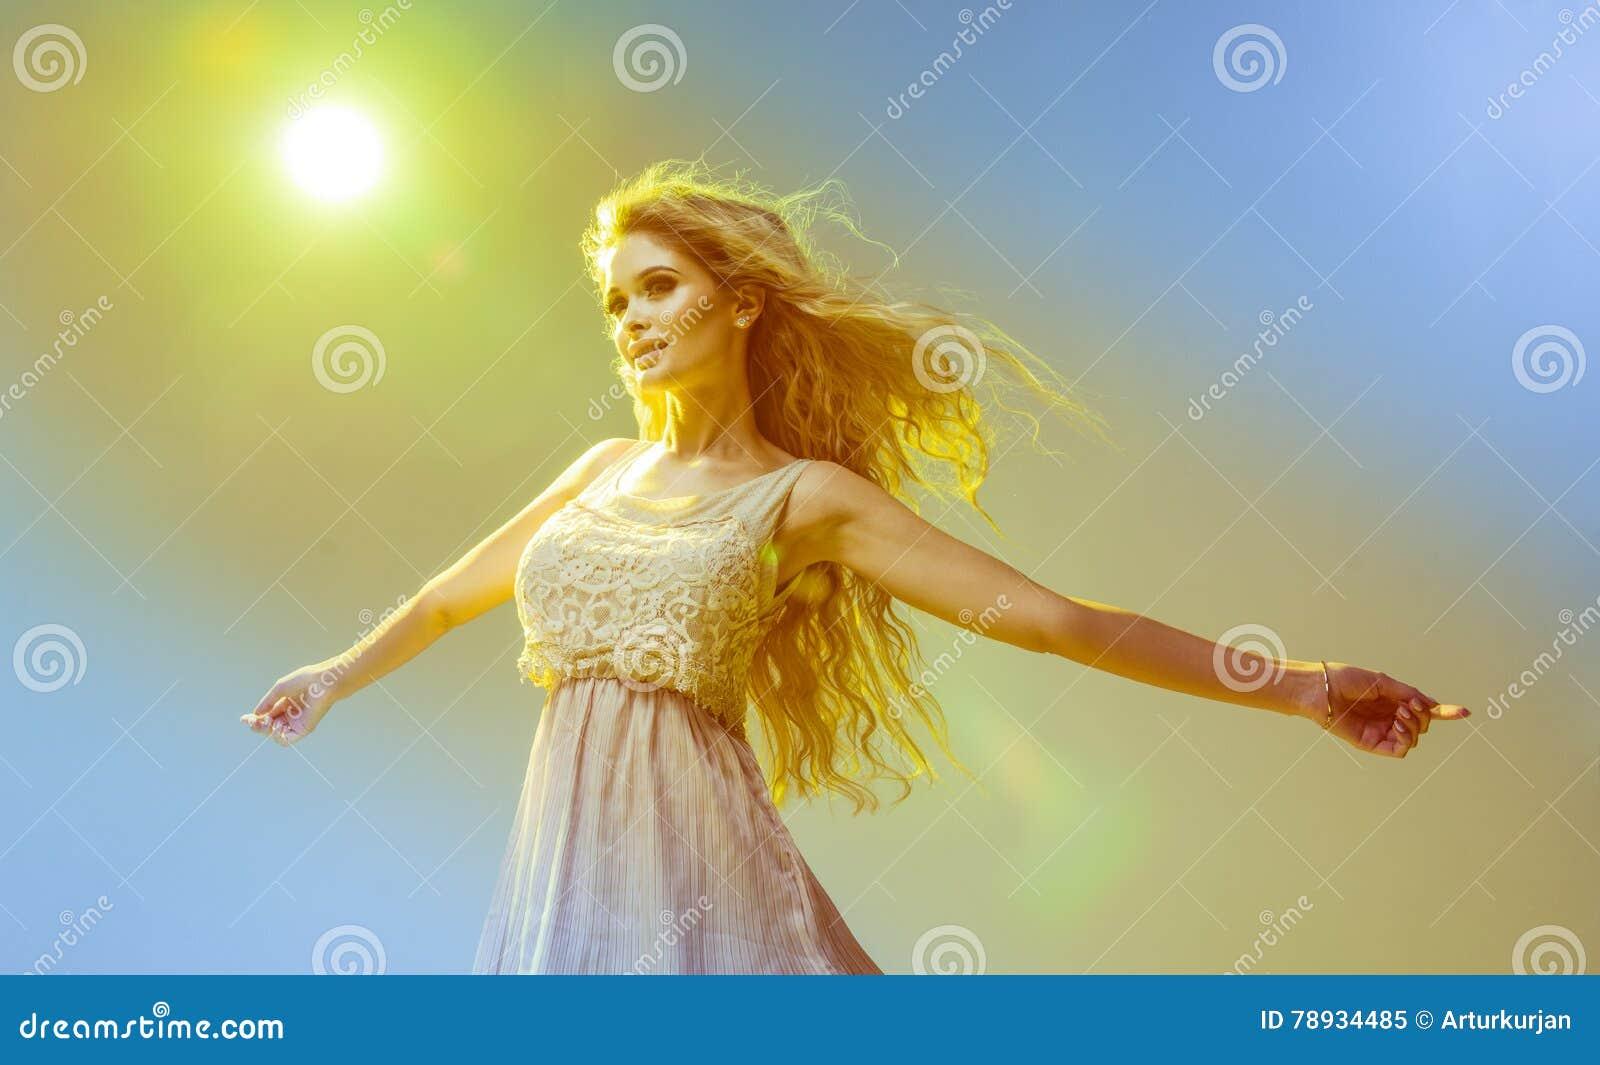 Glamorous Curvy Blonde Woman Stock Image - Image of beautiful ... 9b91a461d7